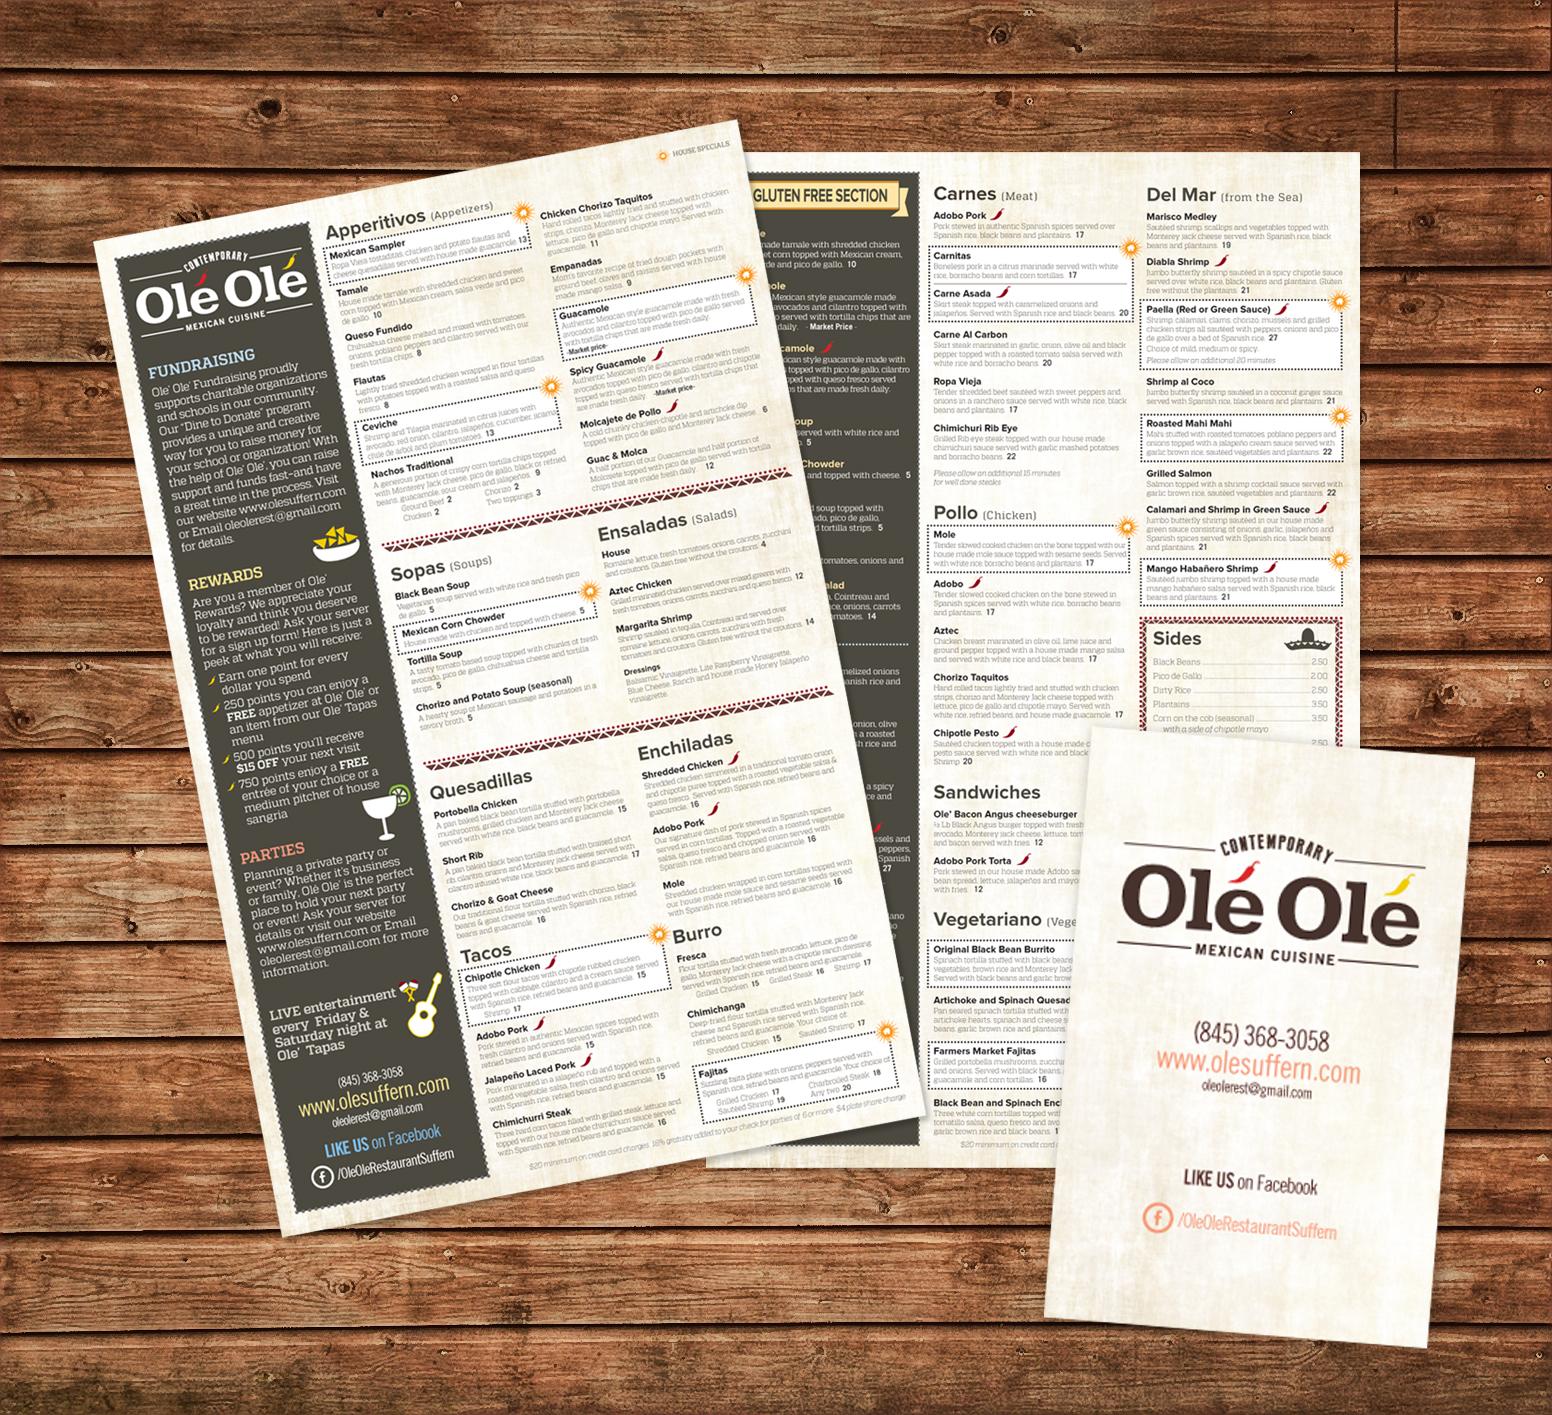 Olé Olé menu designs